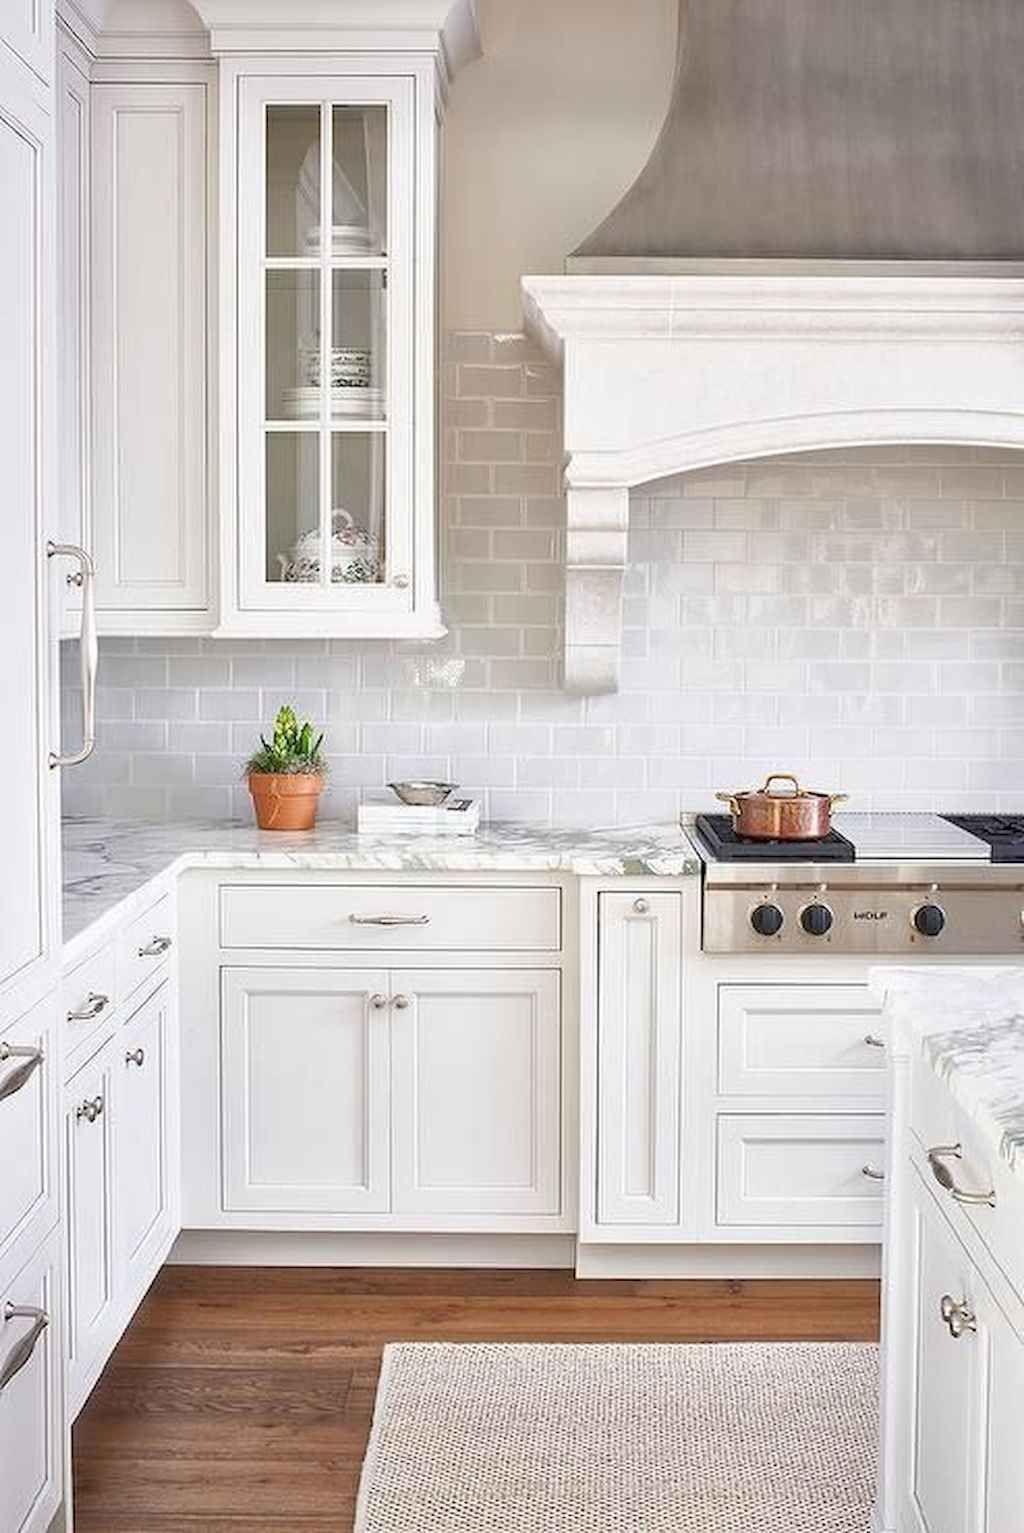 31 Amazing White Kitchen Backsplash Ideas in 2020 ...